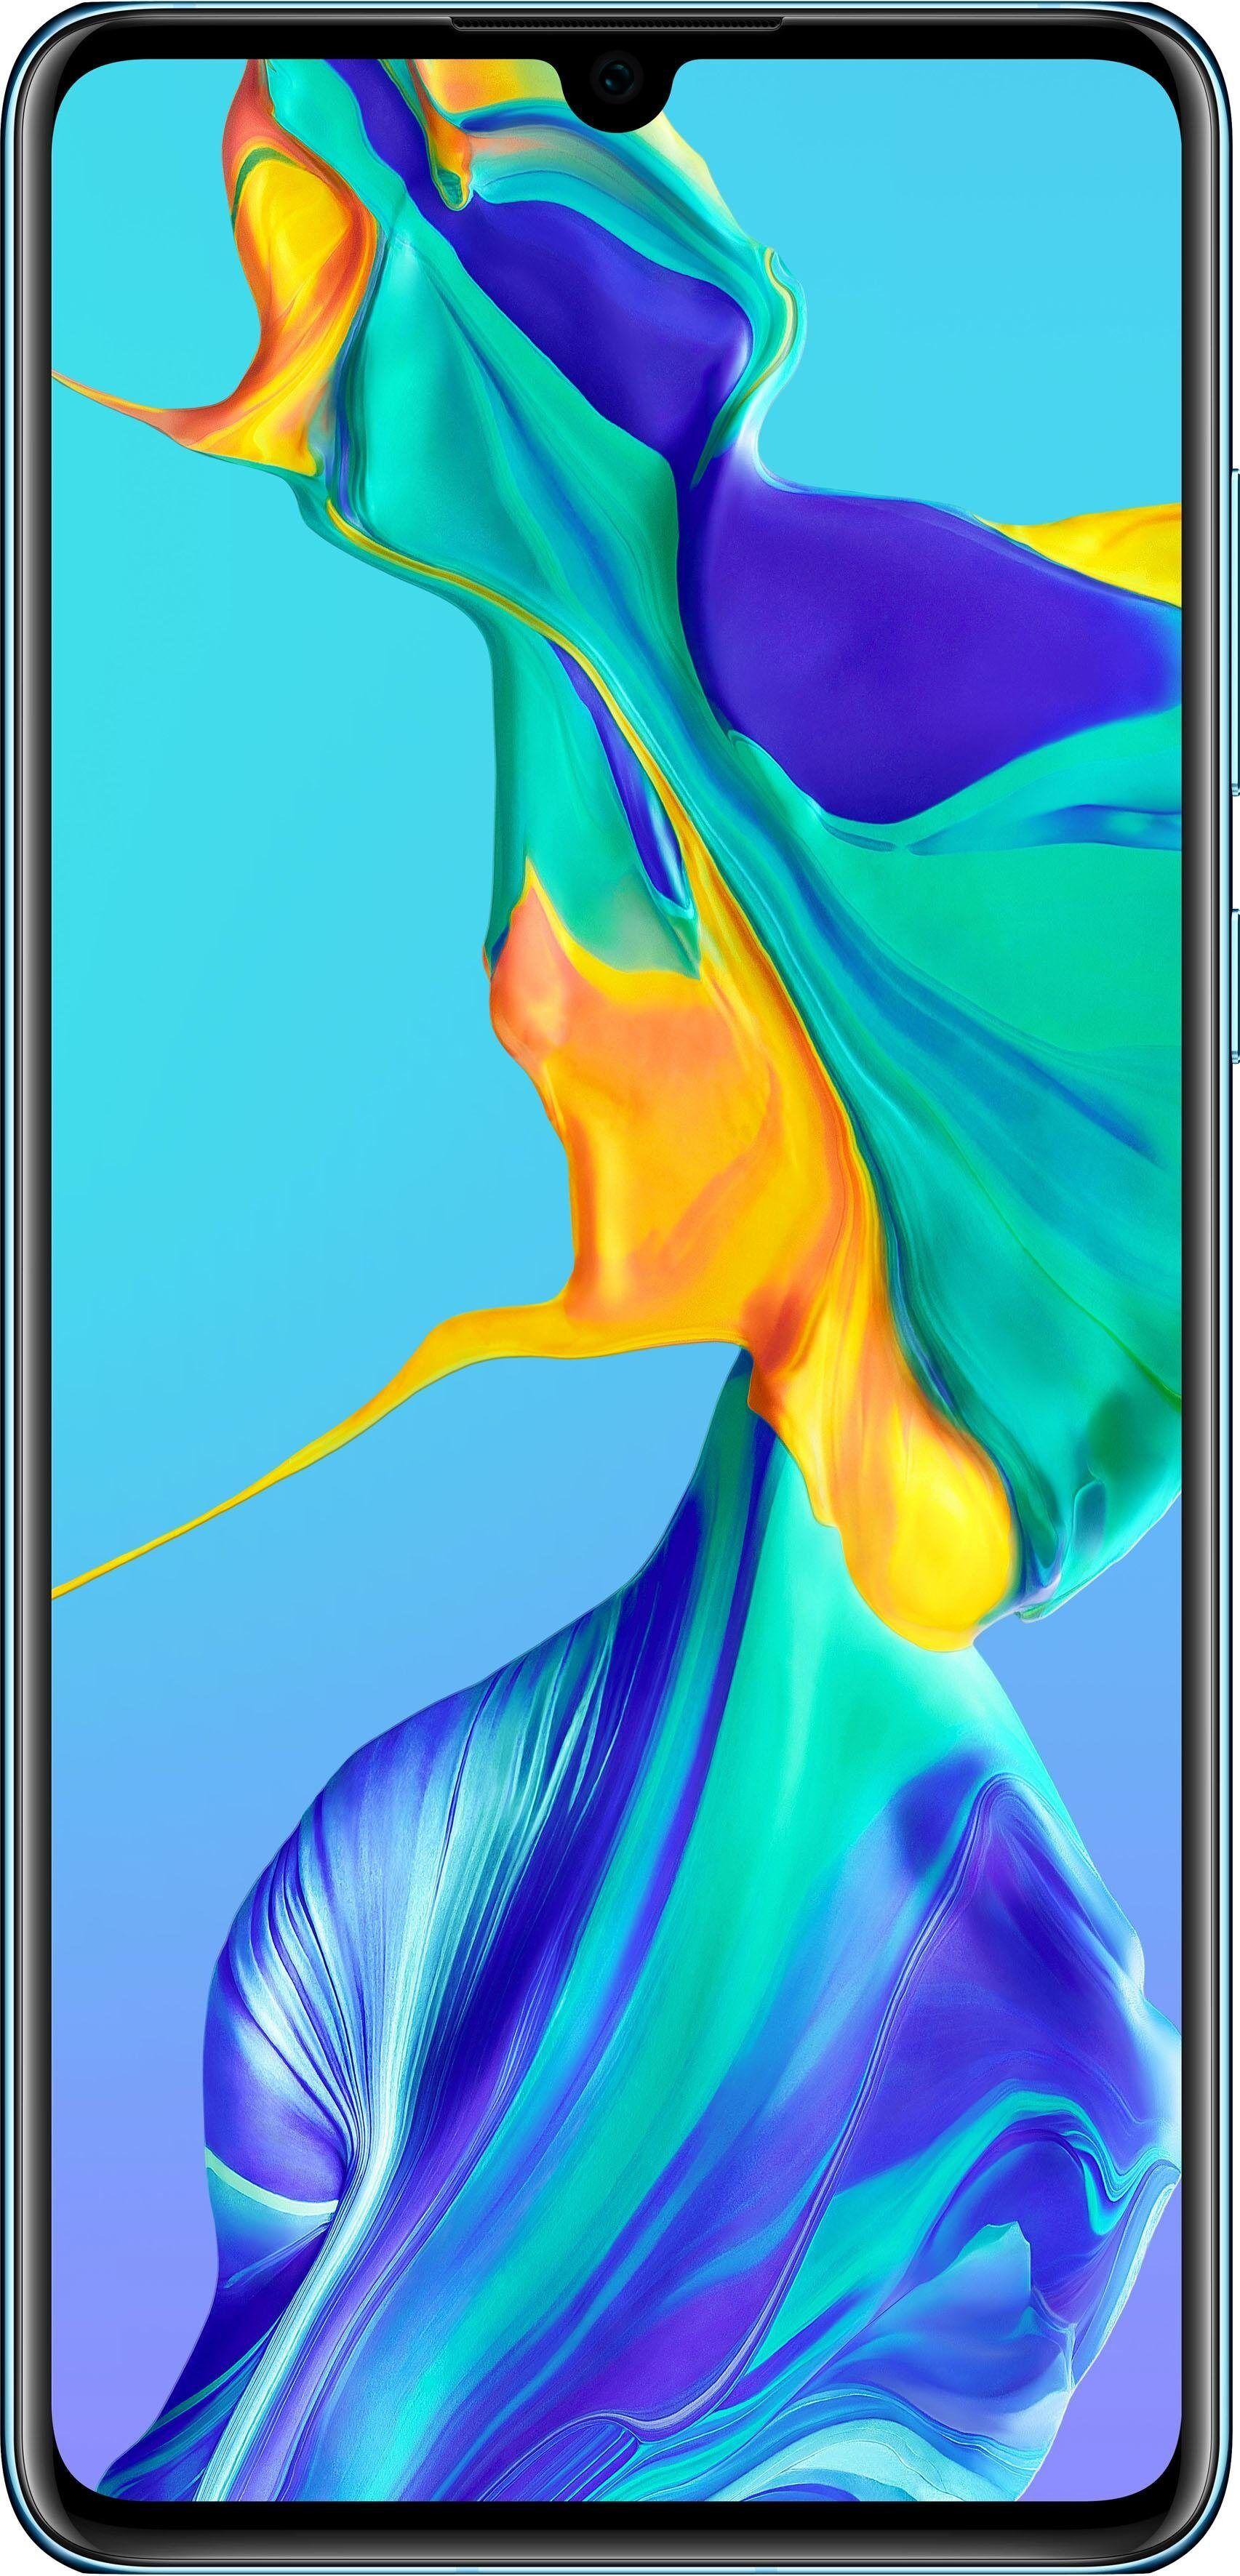 Huawei P30 Smartphone (15,49 cm/6,1 Zoll, 128 GB Speicherplatz), breathing crystal